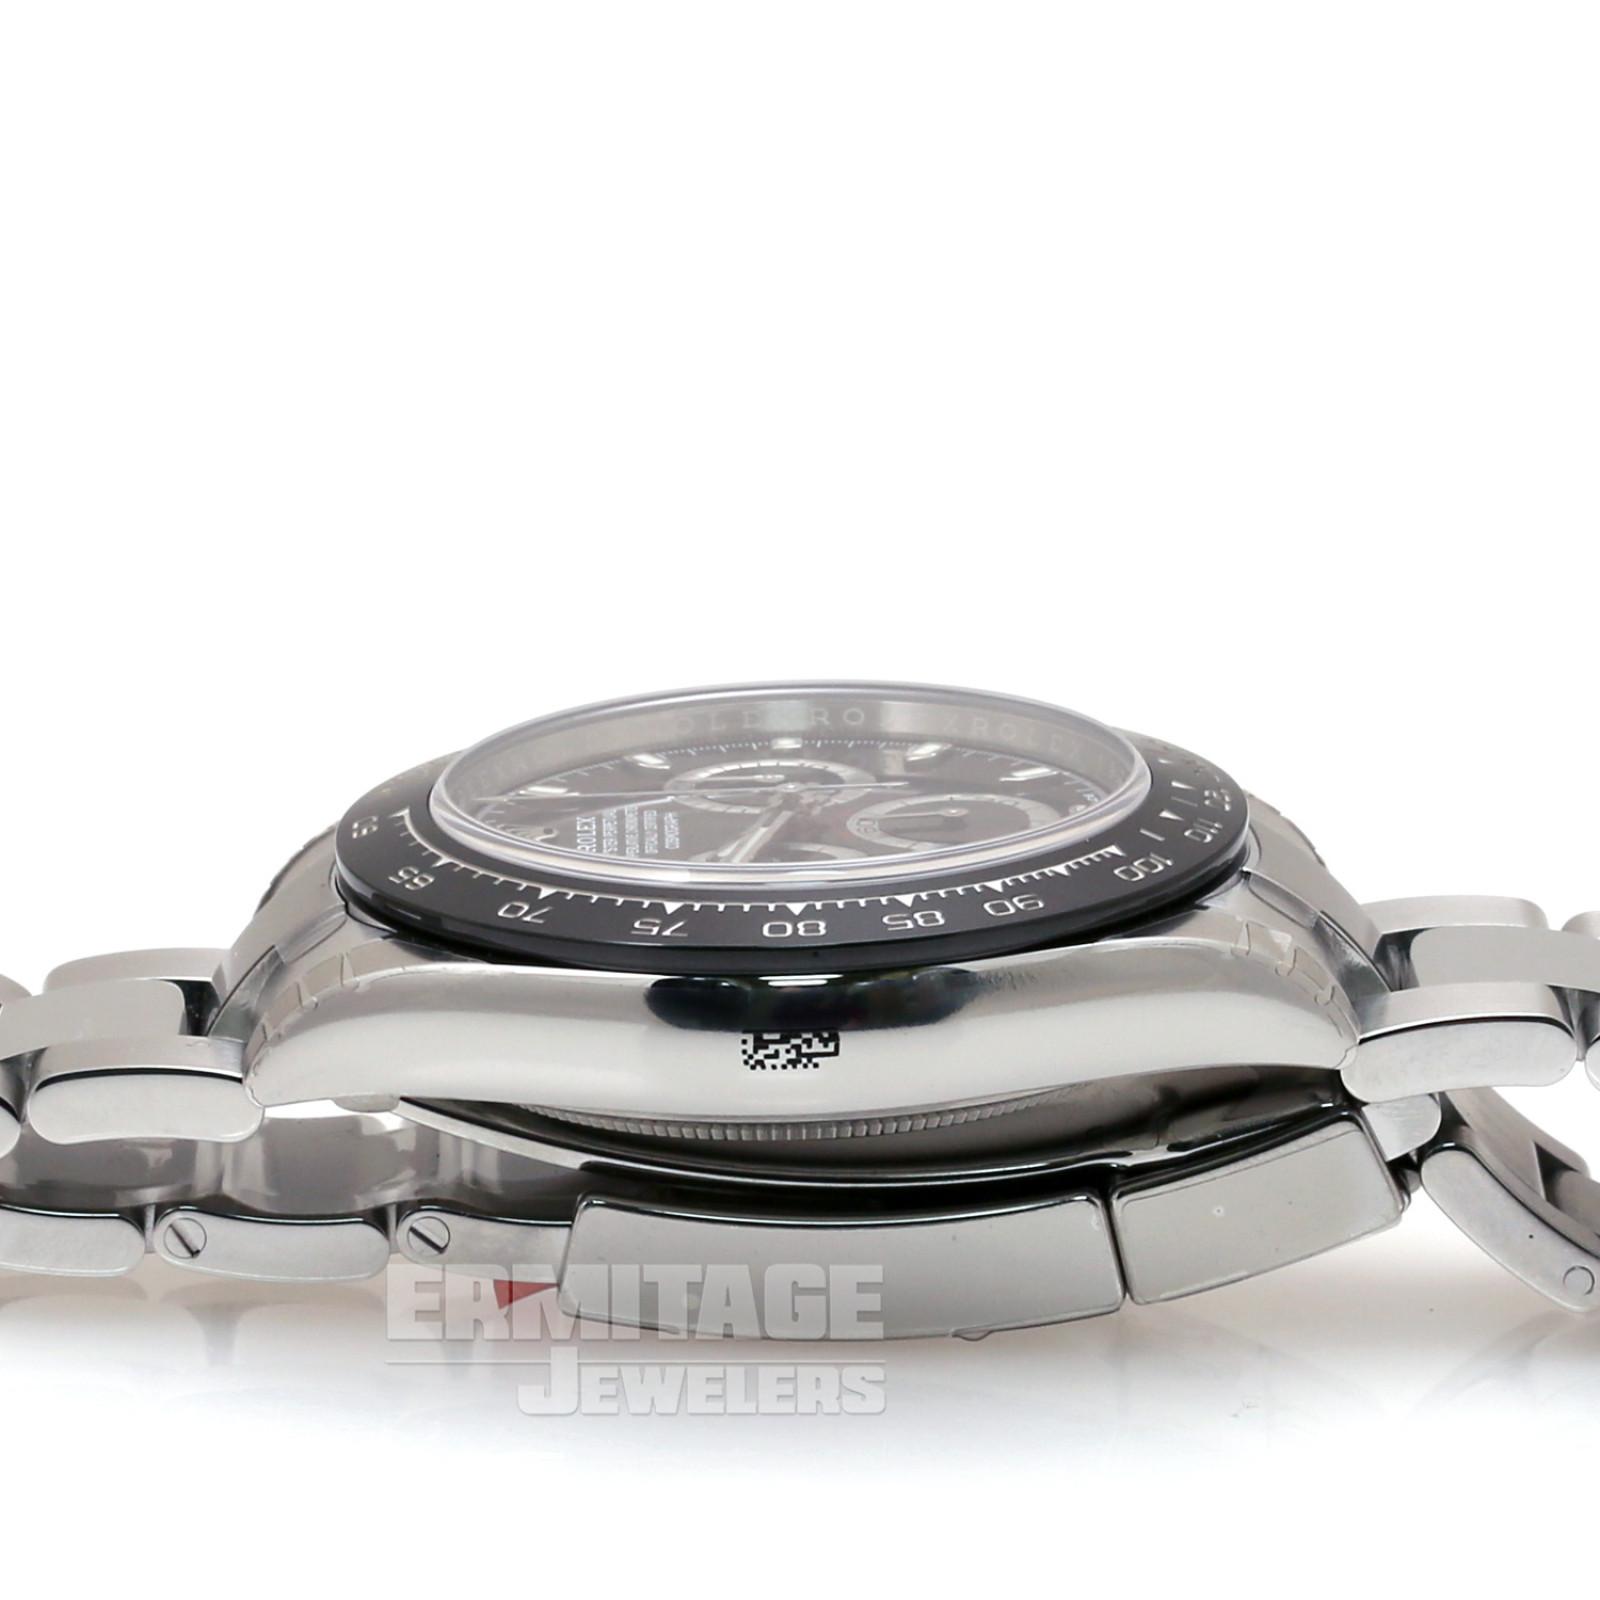 Steel on Oyster Rolex Daytona 116500 40 mm